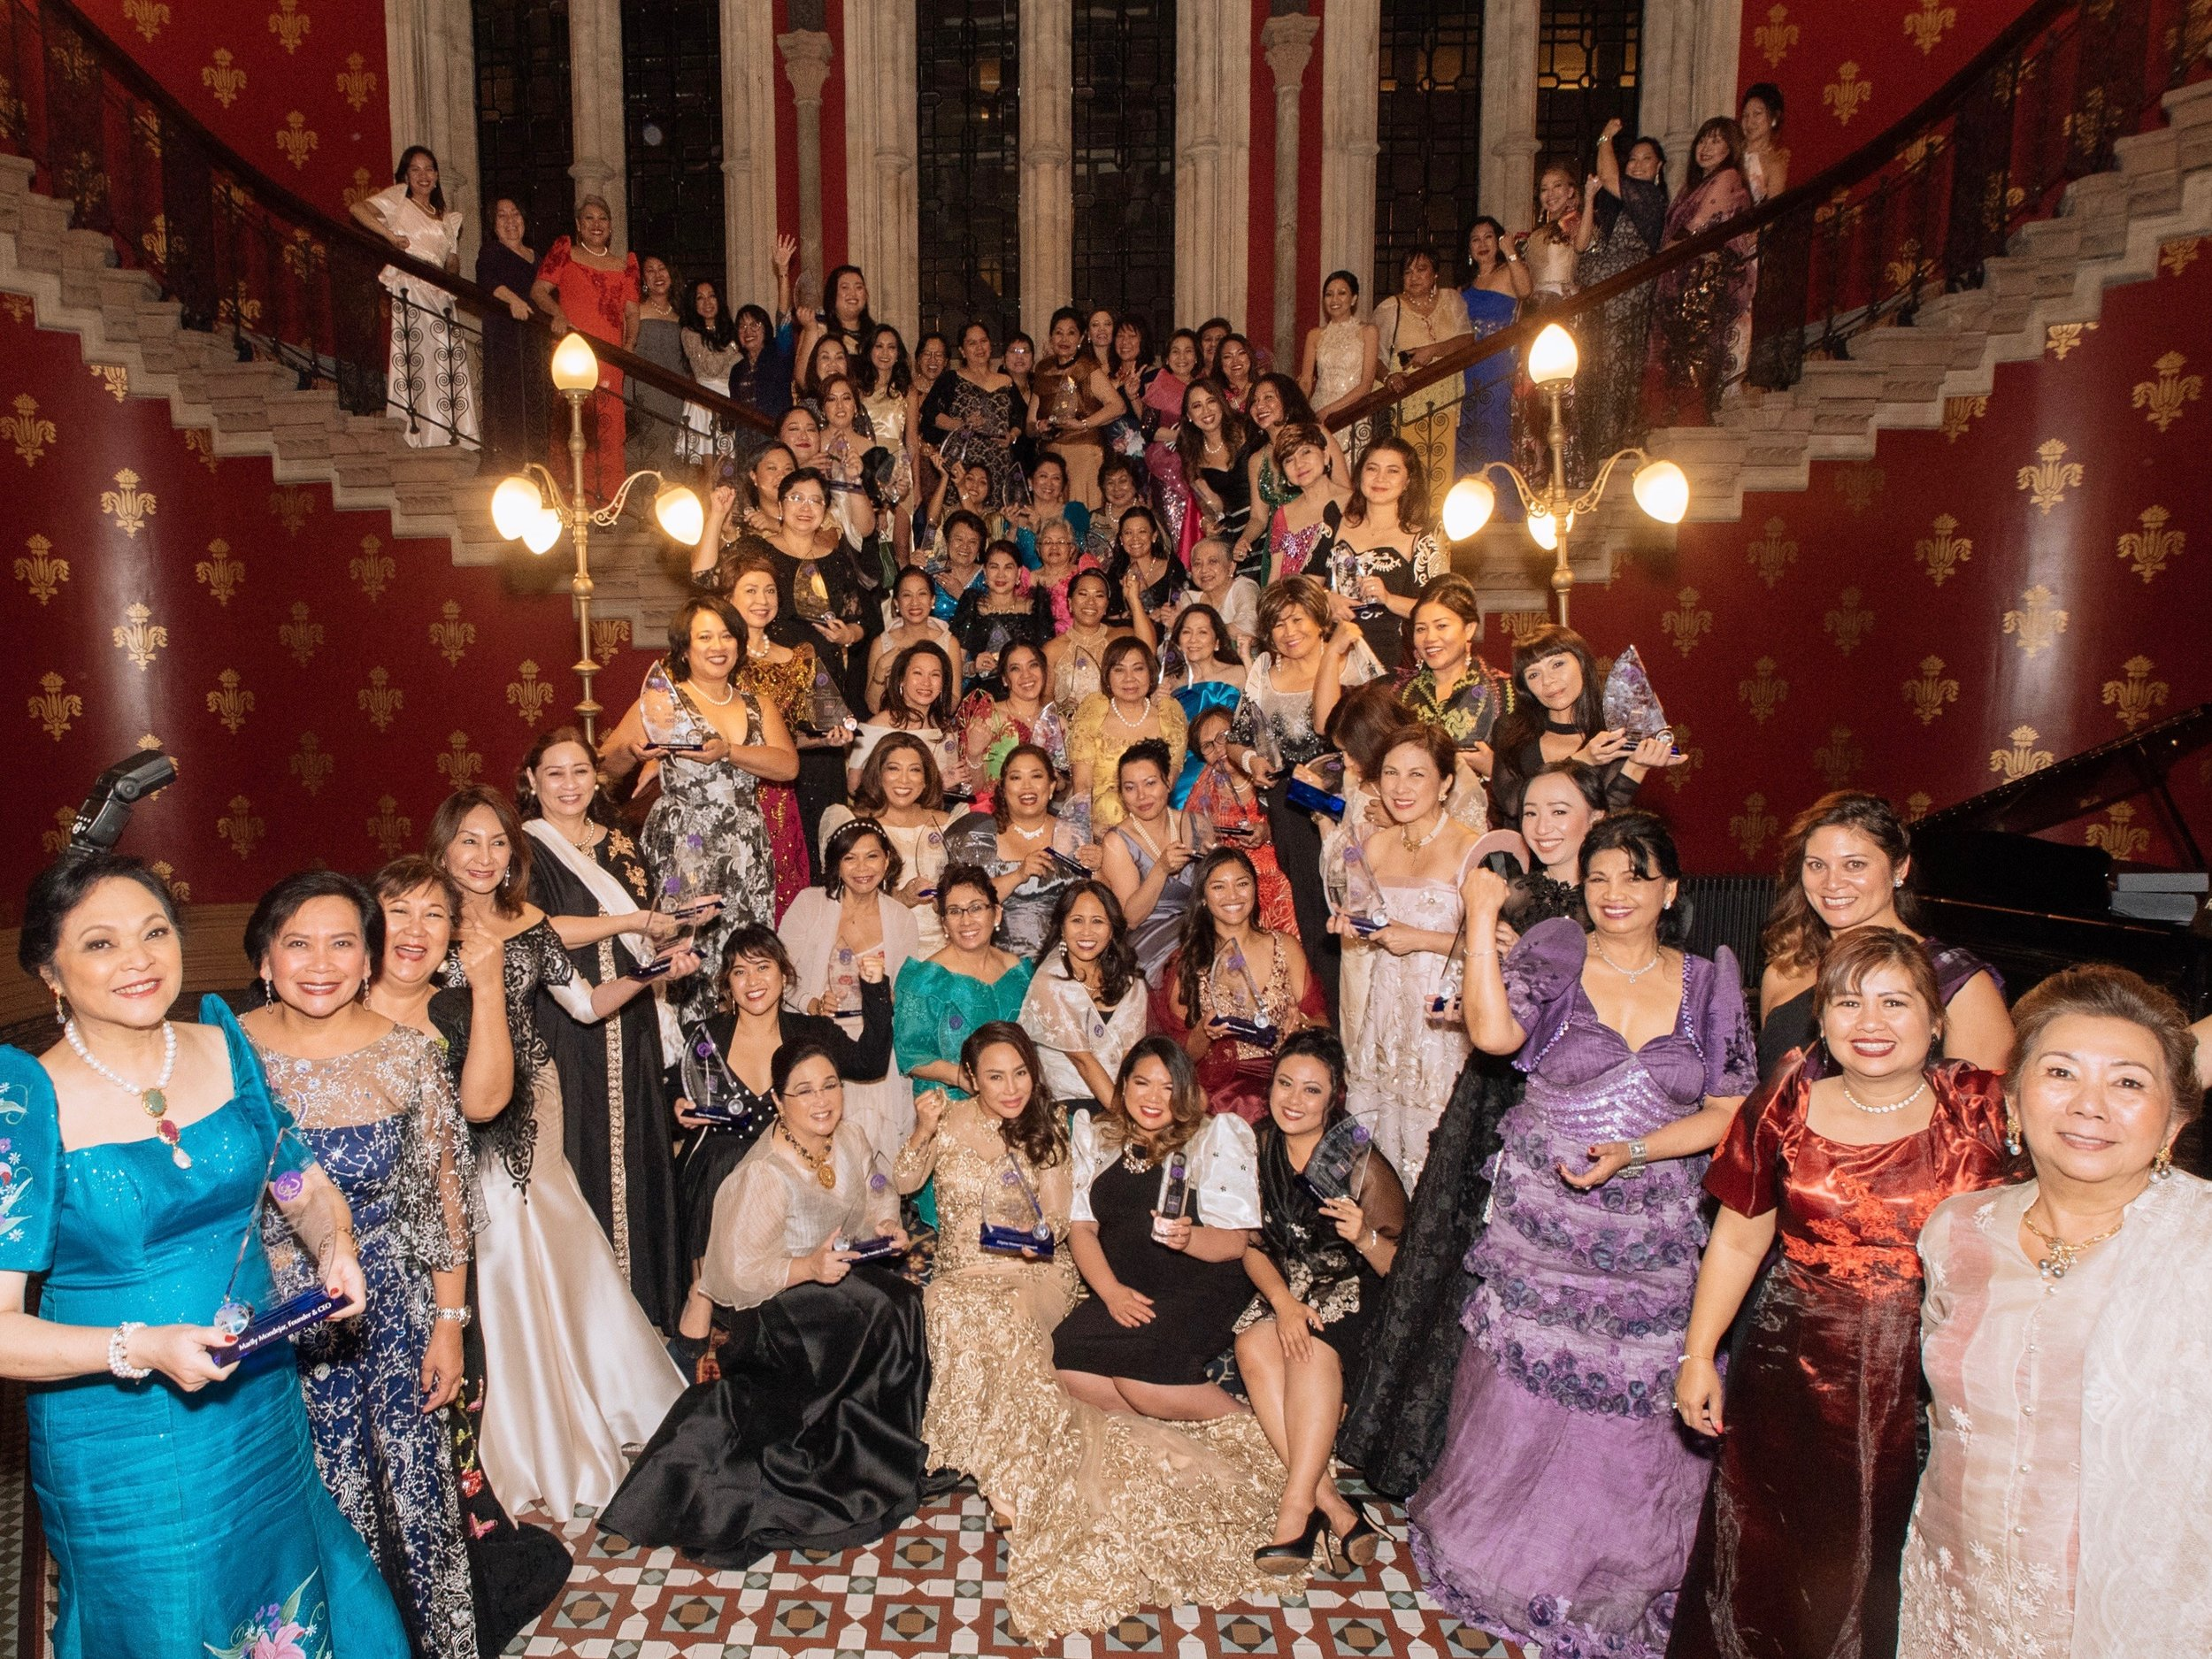 Global FWN100™ 2018 Awardees at the St. Pancras Renaissance in London, UK, September 14, 2018